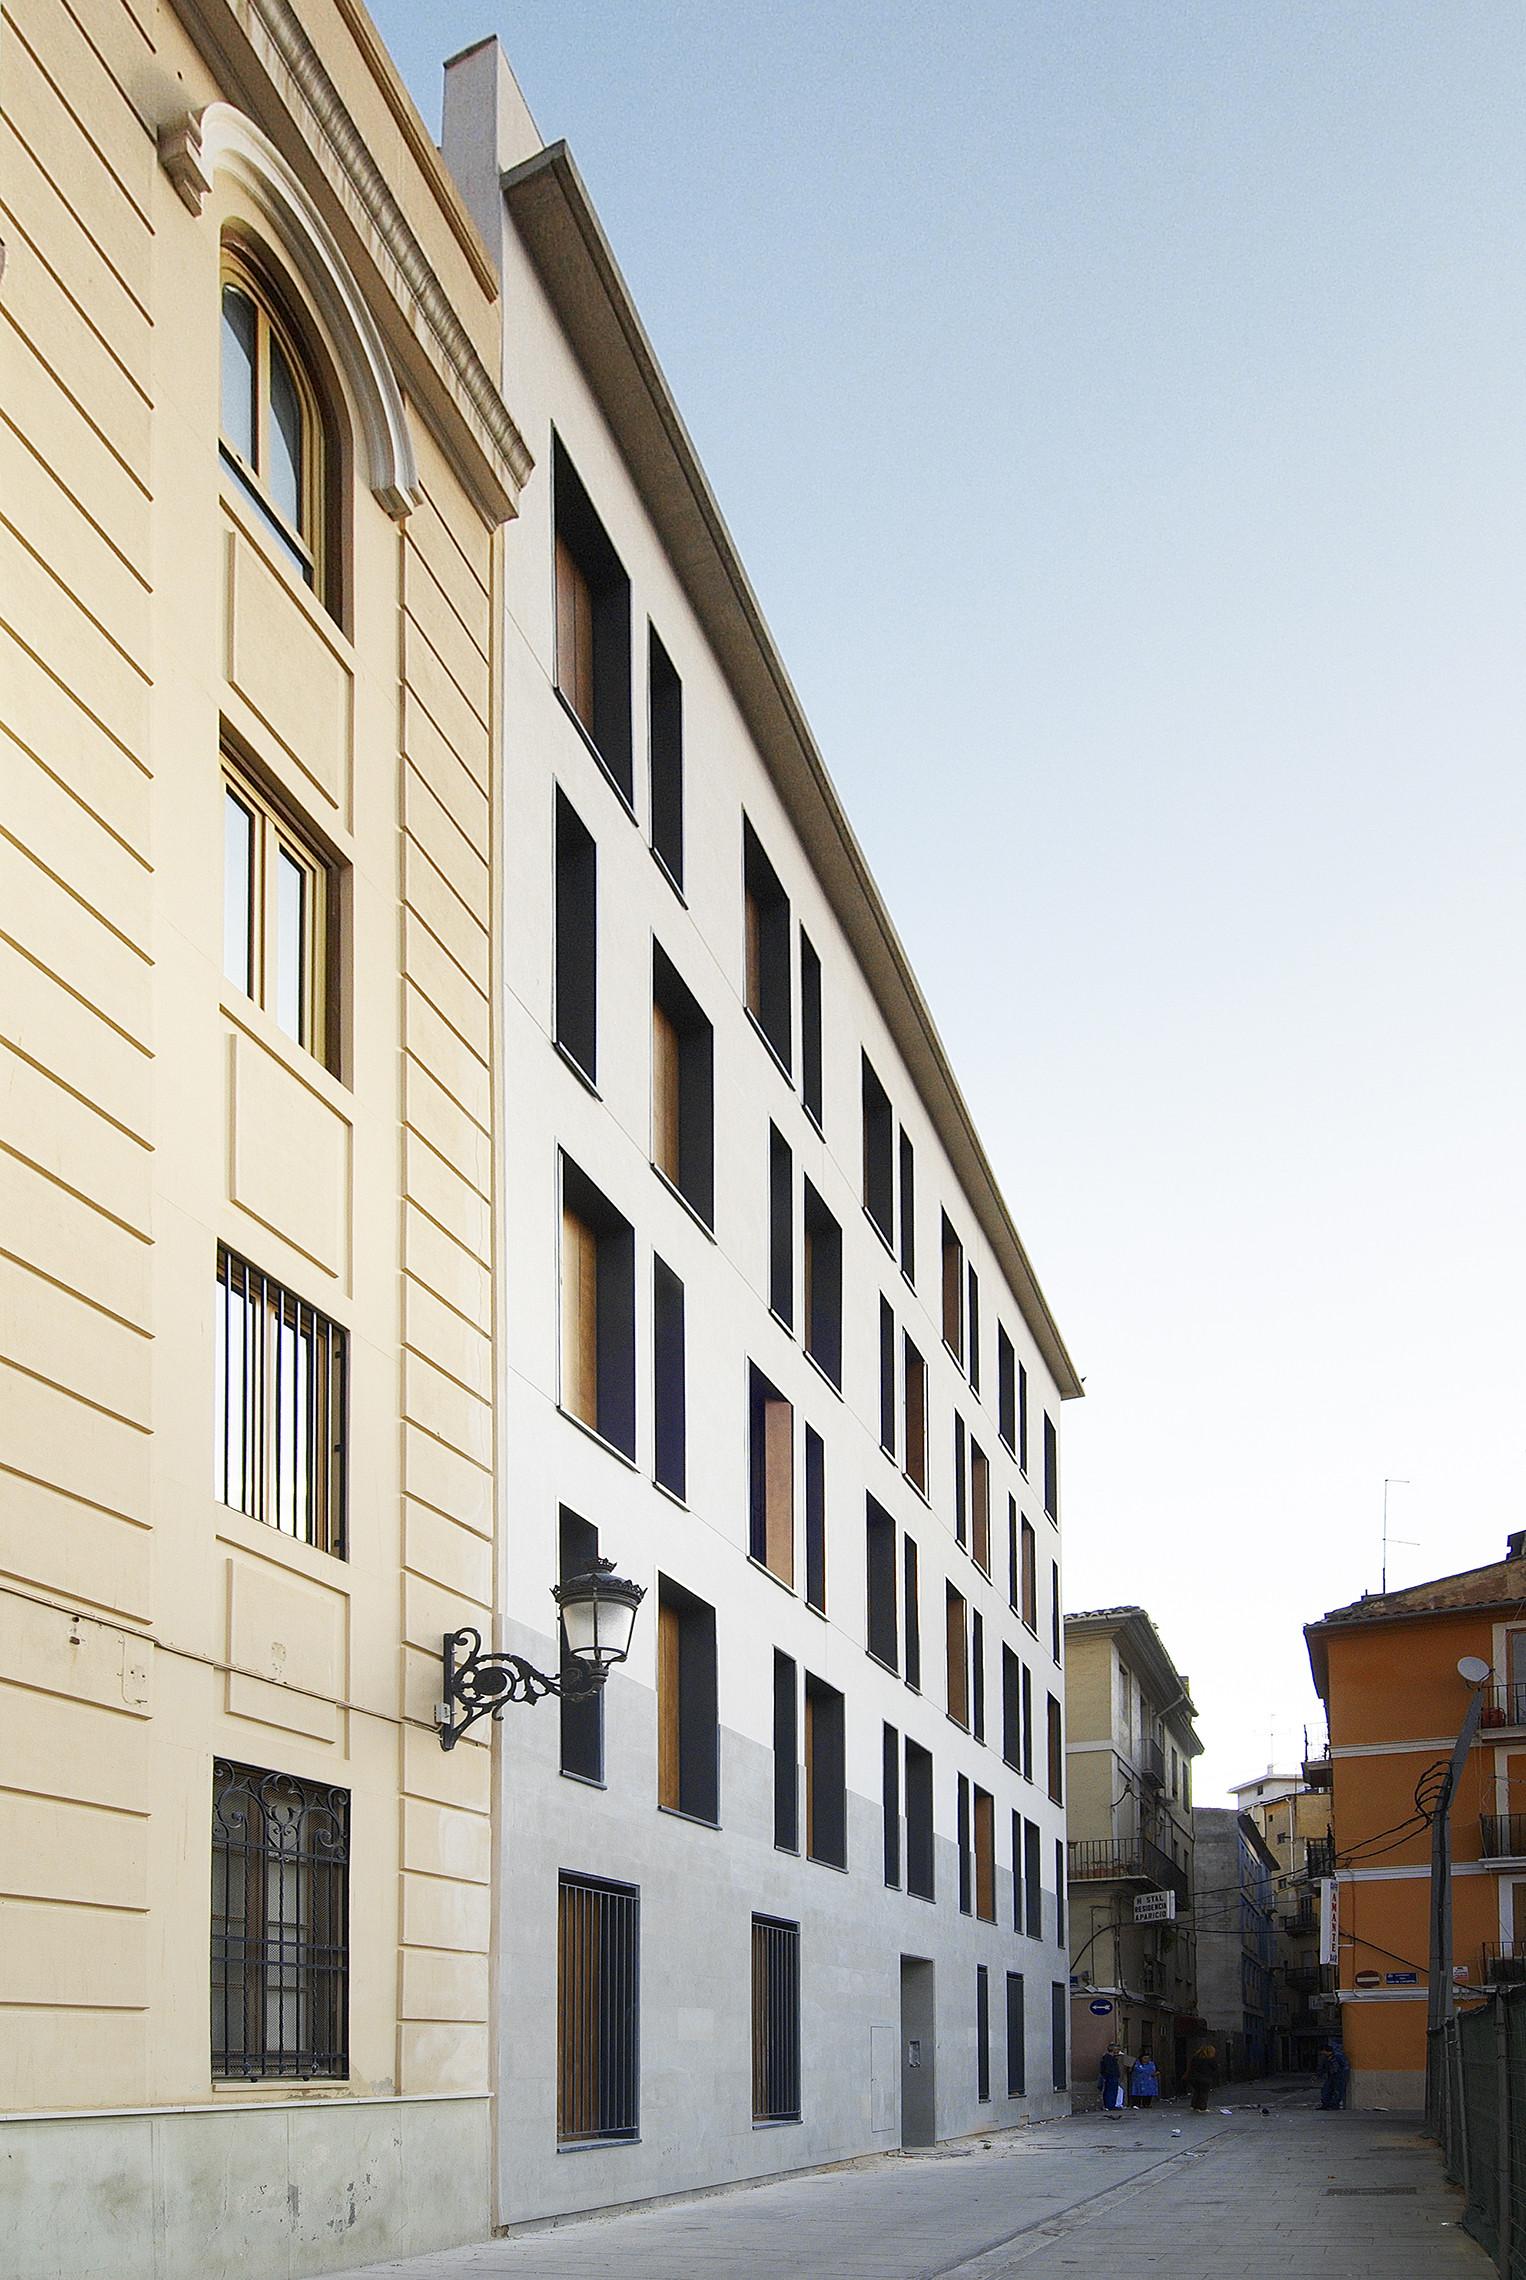 Gallery of 19 dwellings on viana street garc a floquet - Calle viana valencia ...